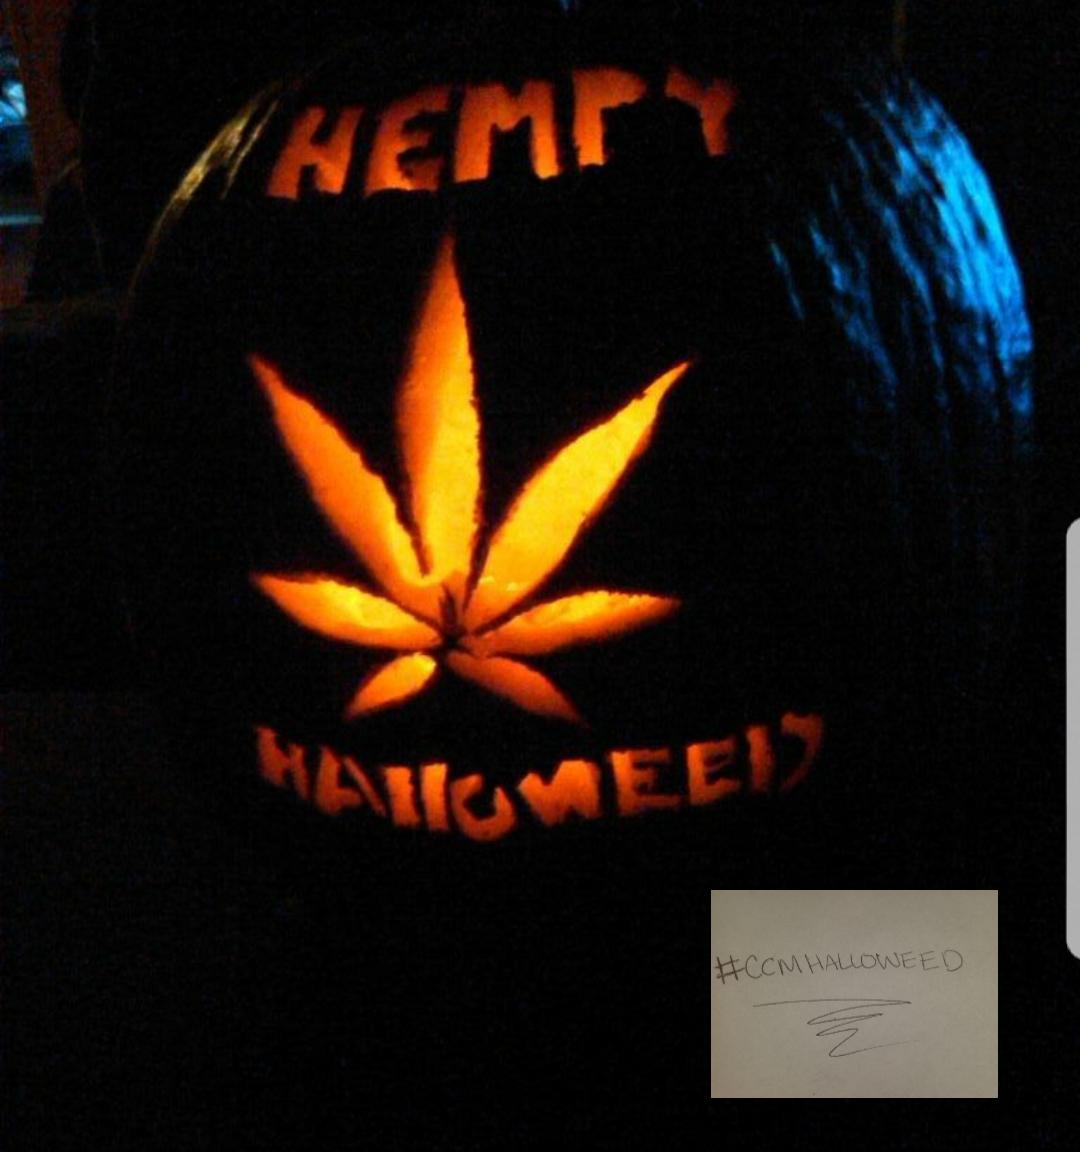 Hempy Halloweed.png